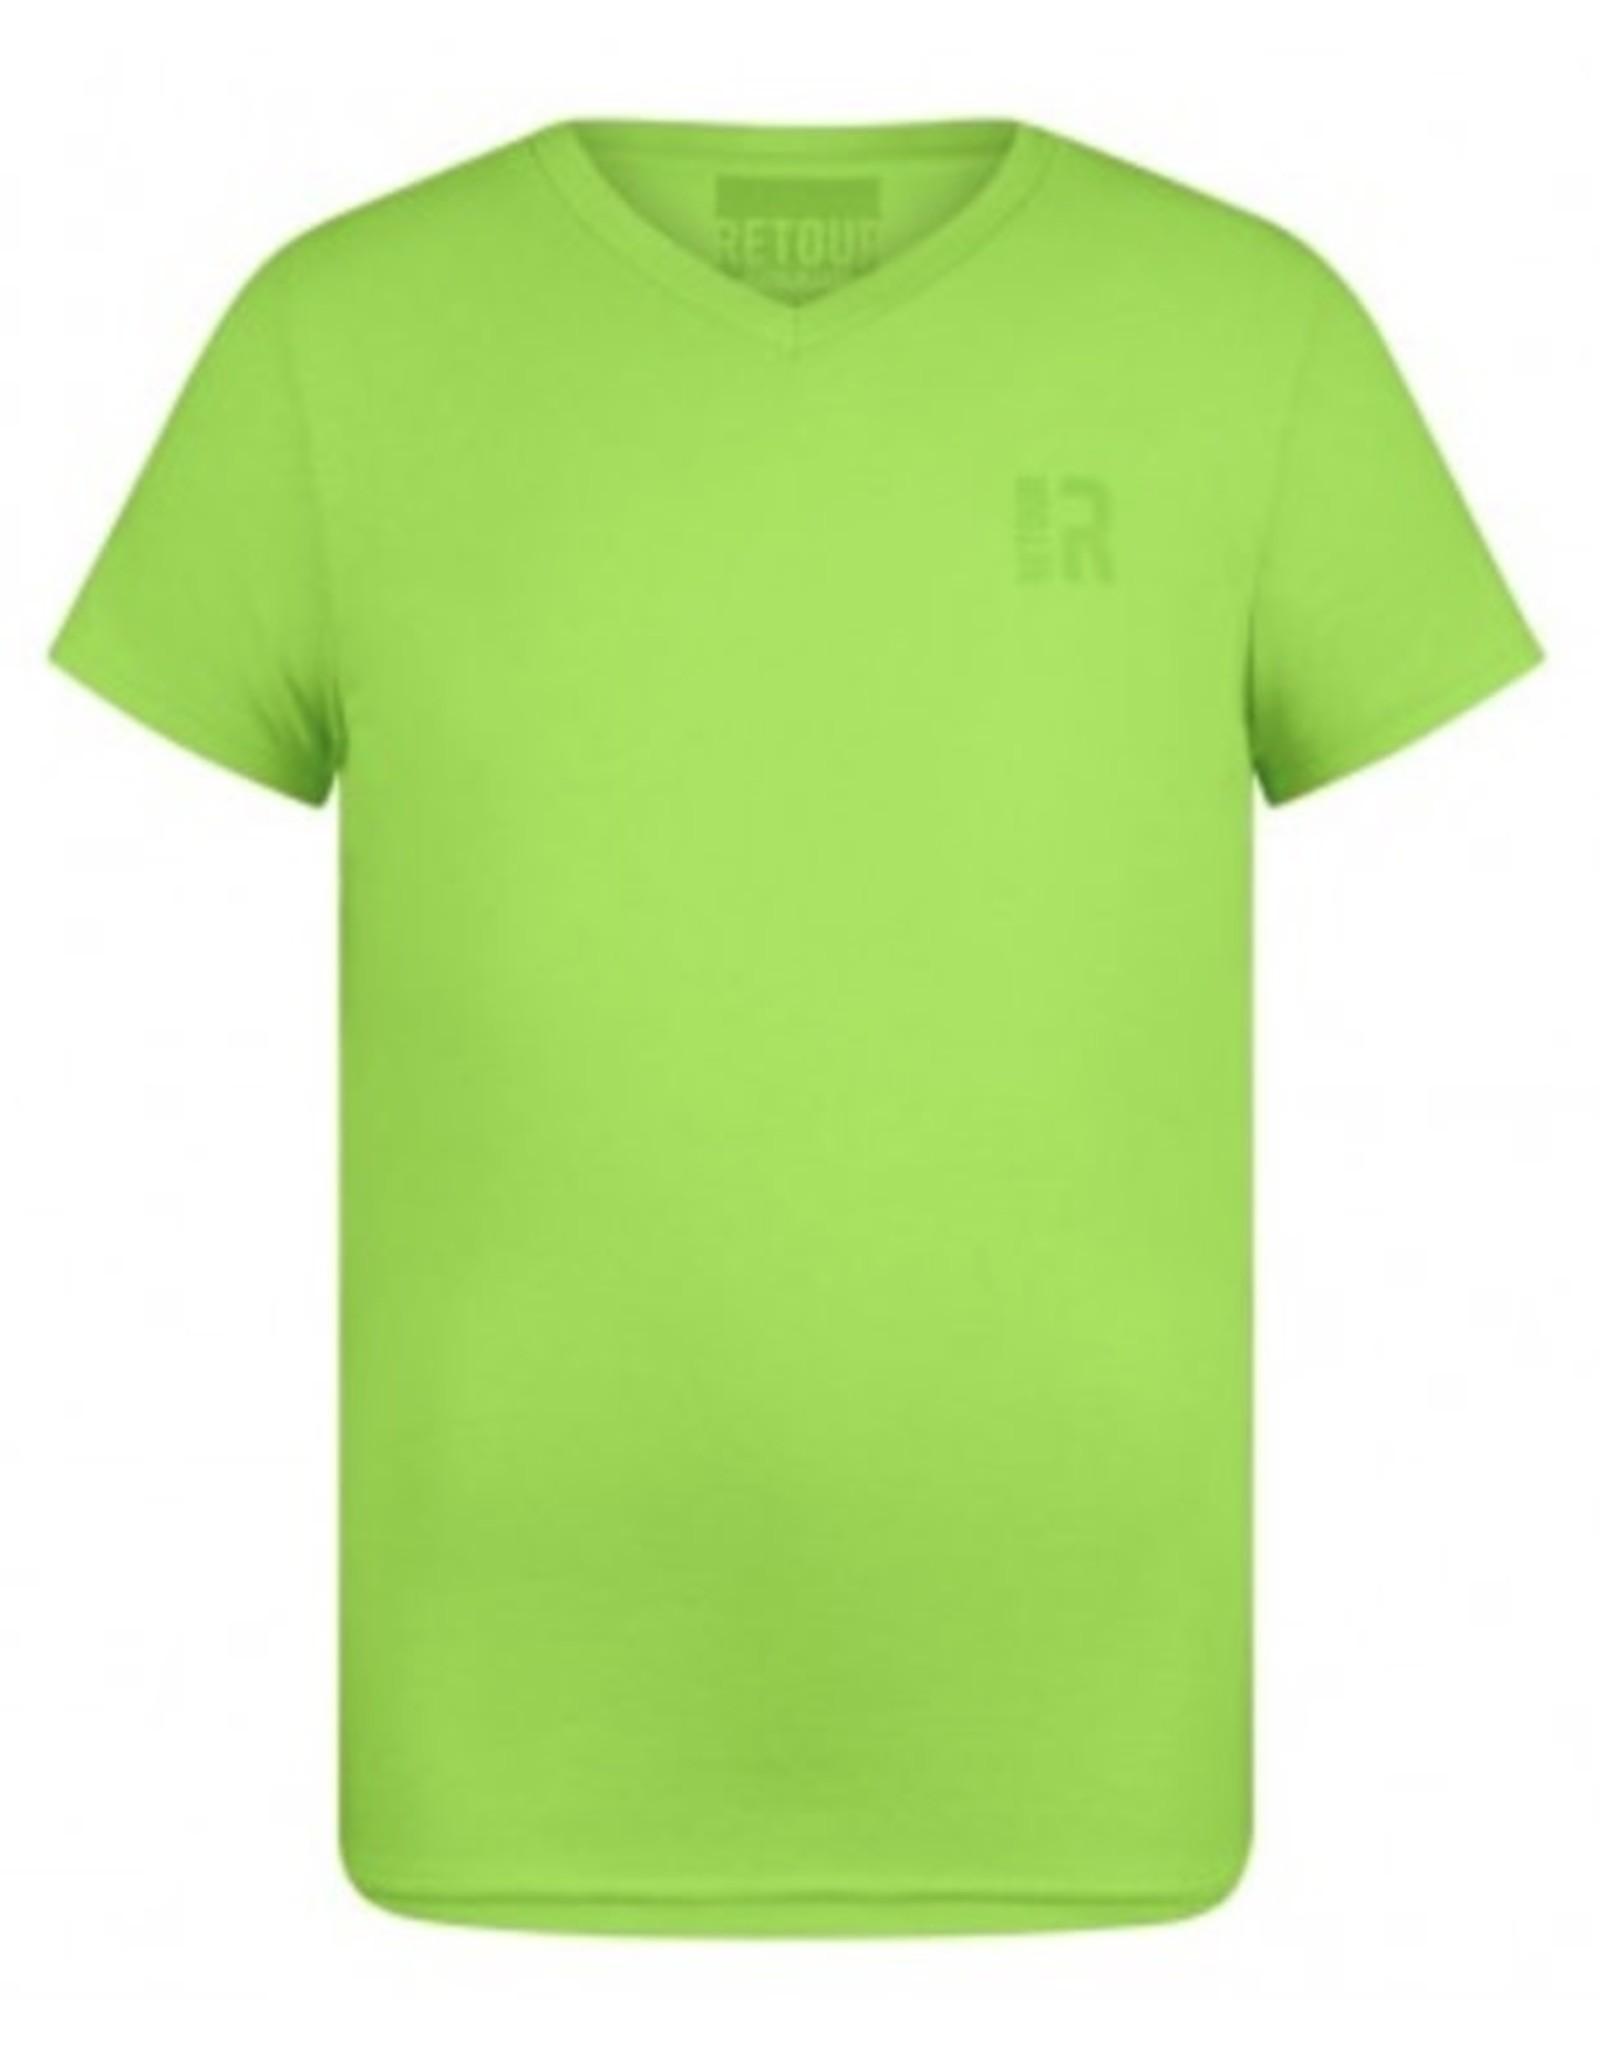 Retour Sean T-shirt